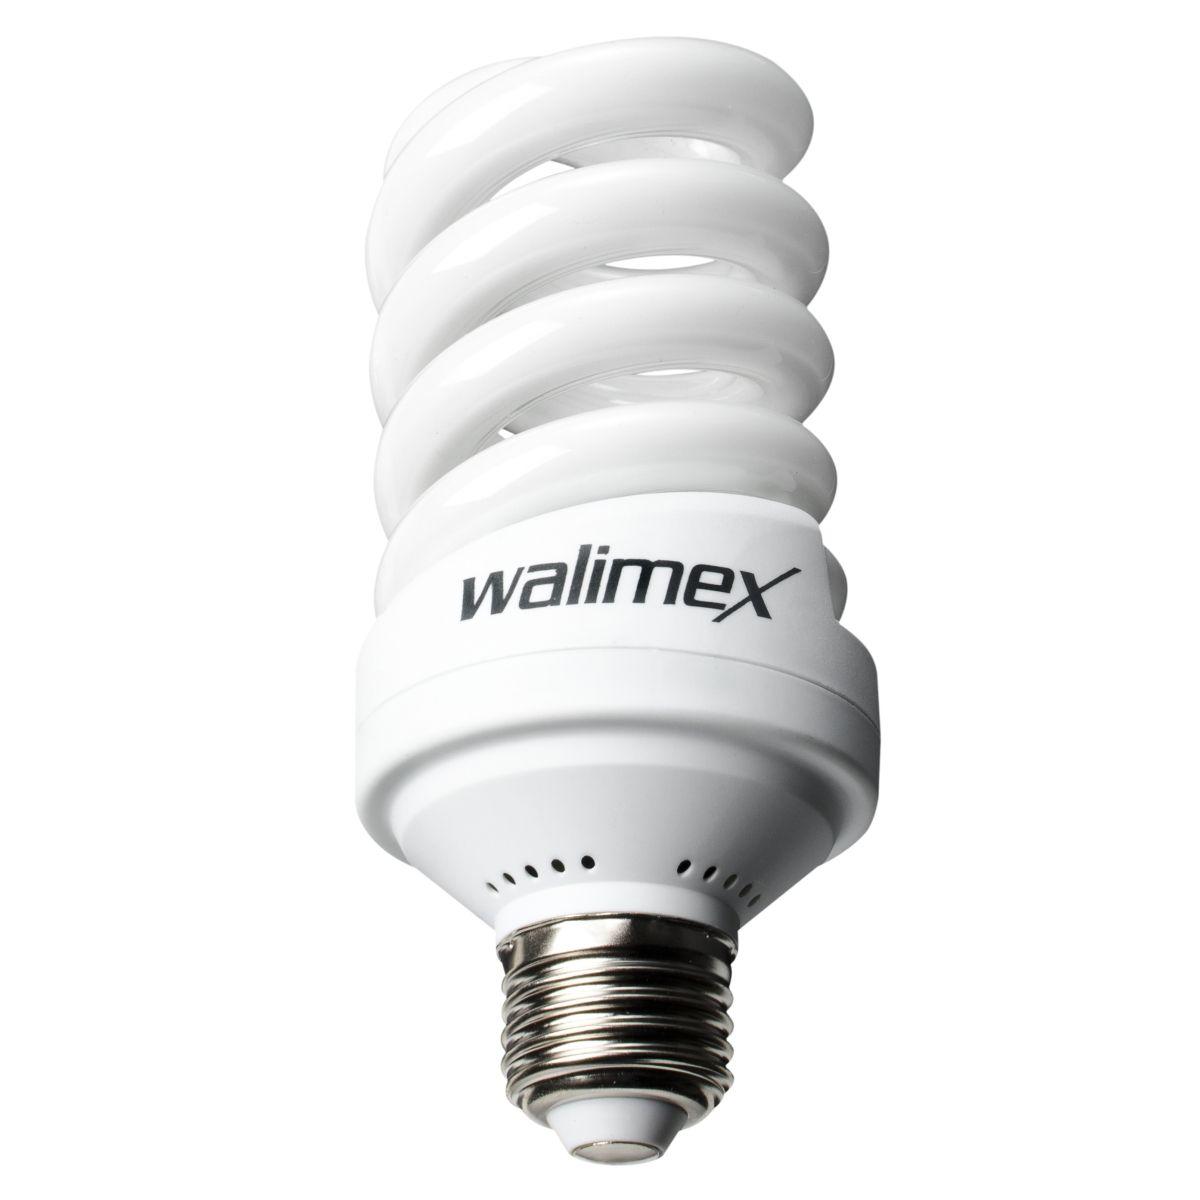 Walimex pro Lamp 24W equates 120W